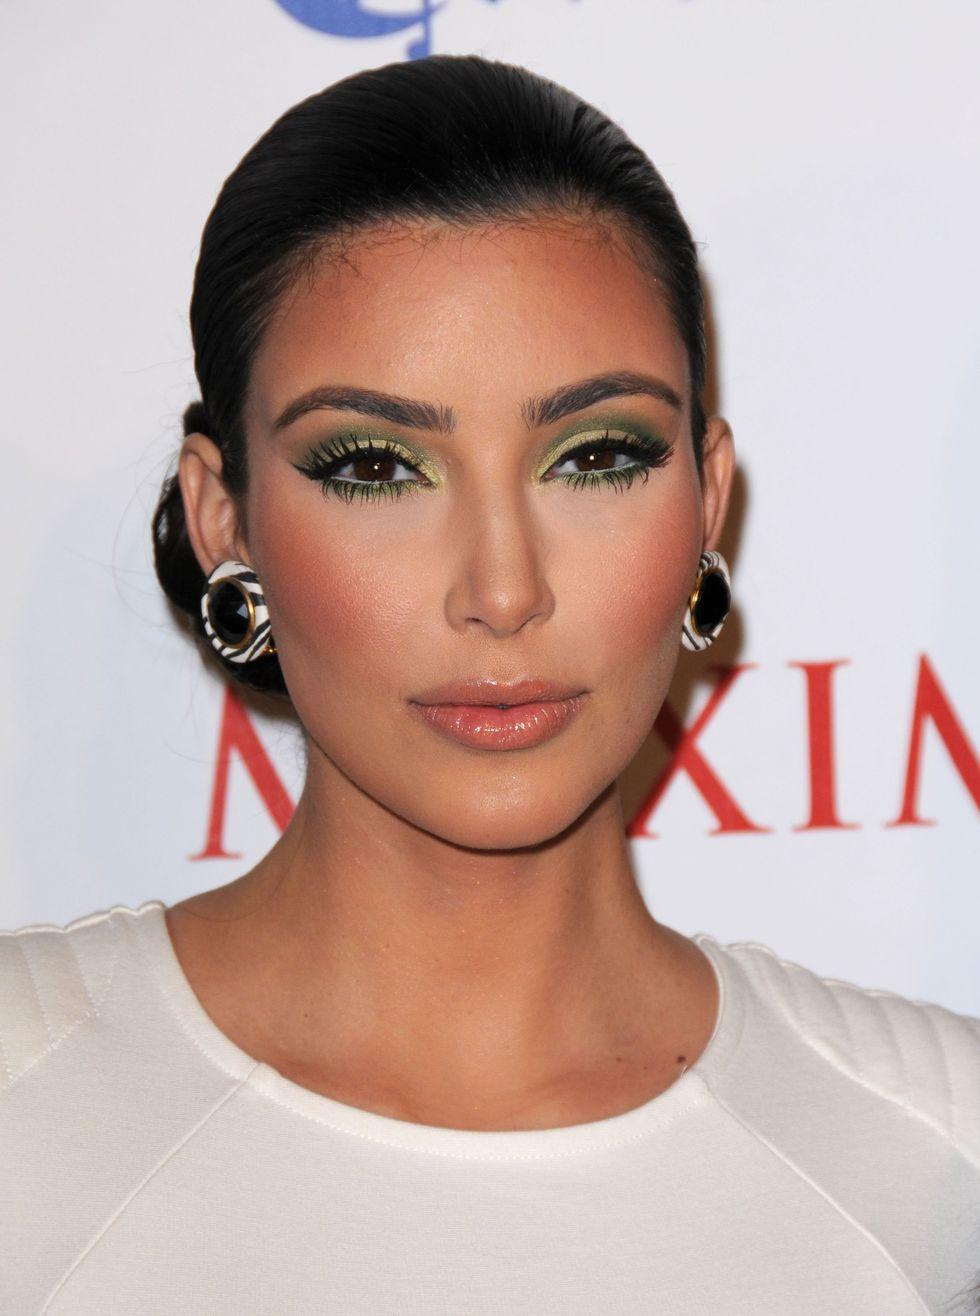 kim-kardashian-maxims-10th-annual-hot-100-celebration-01